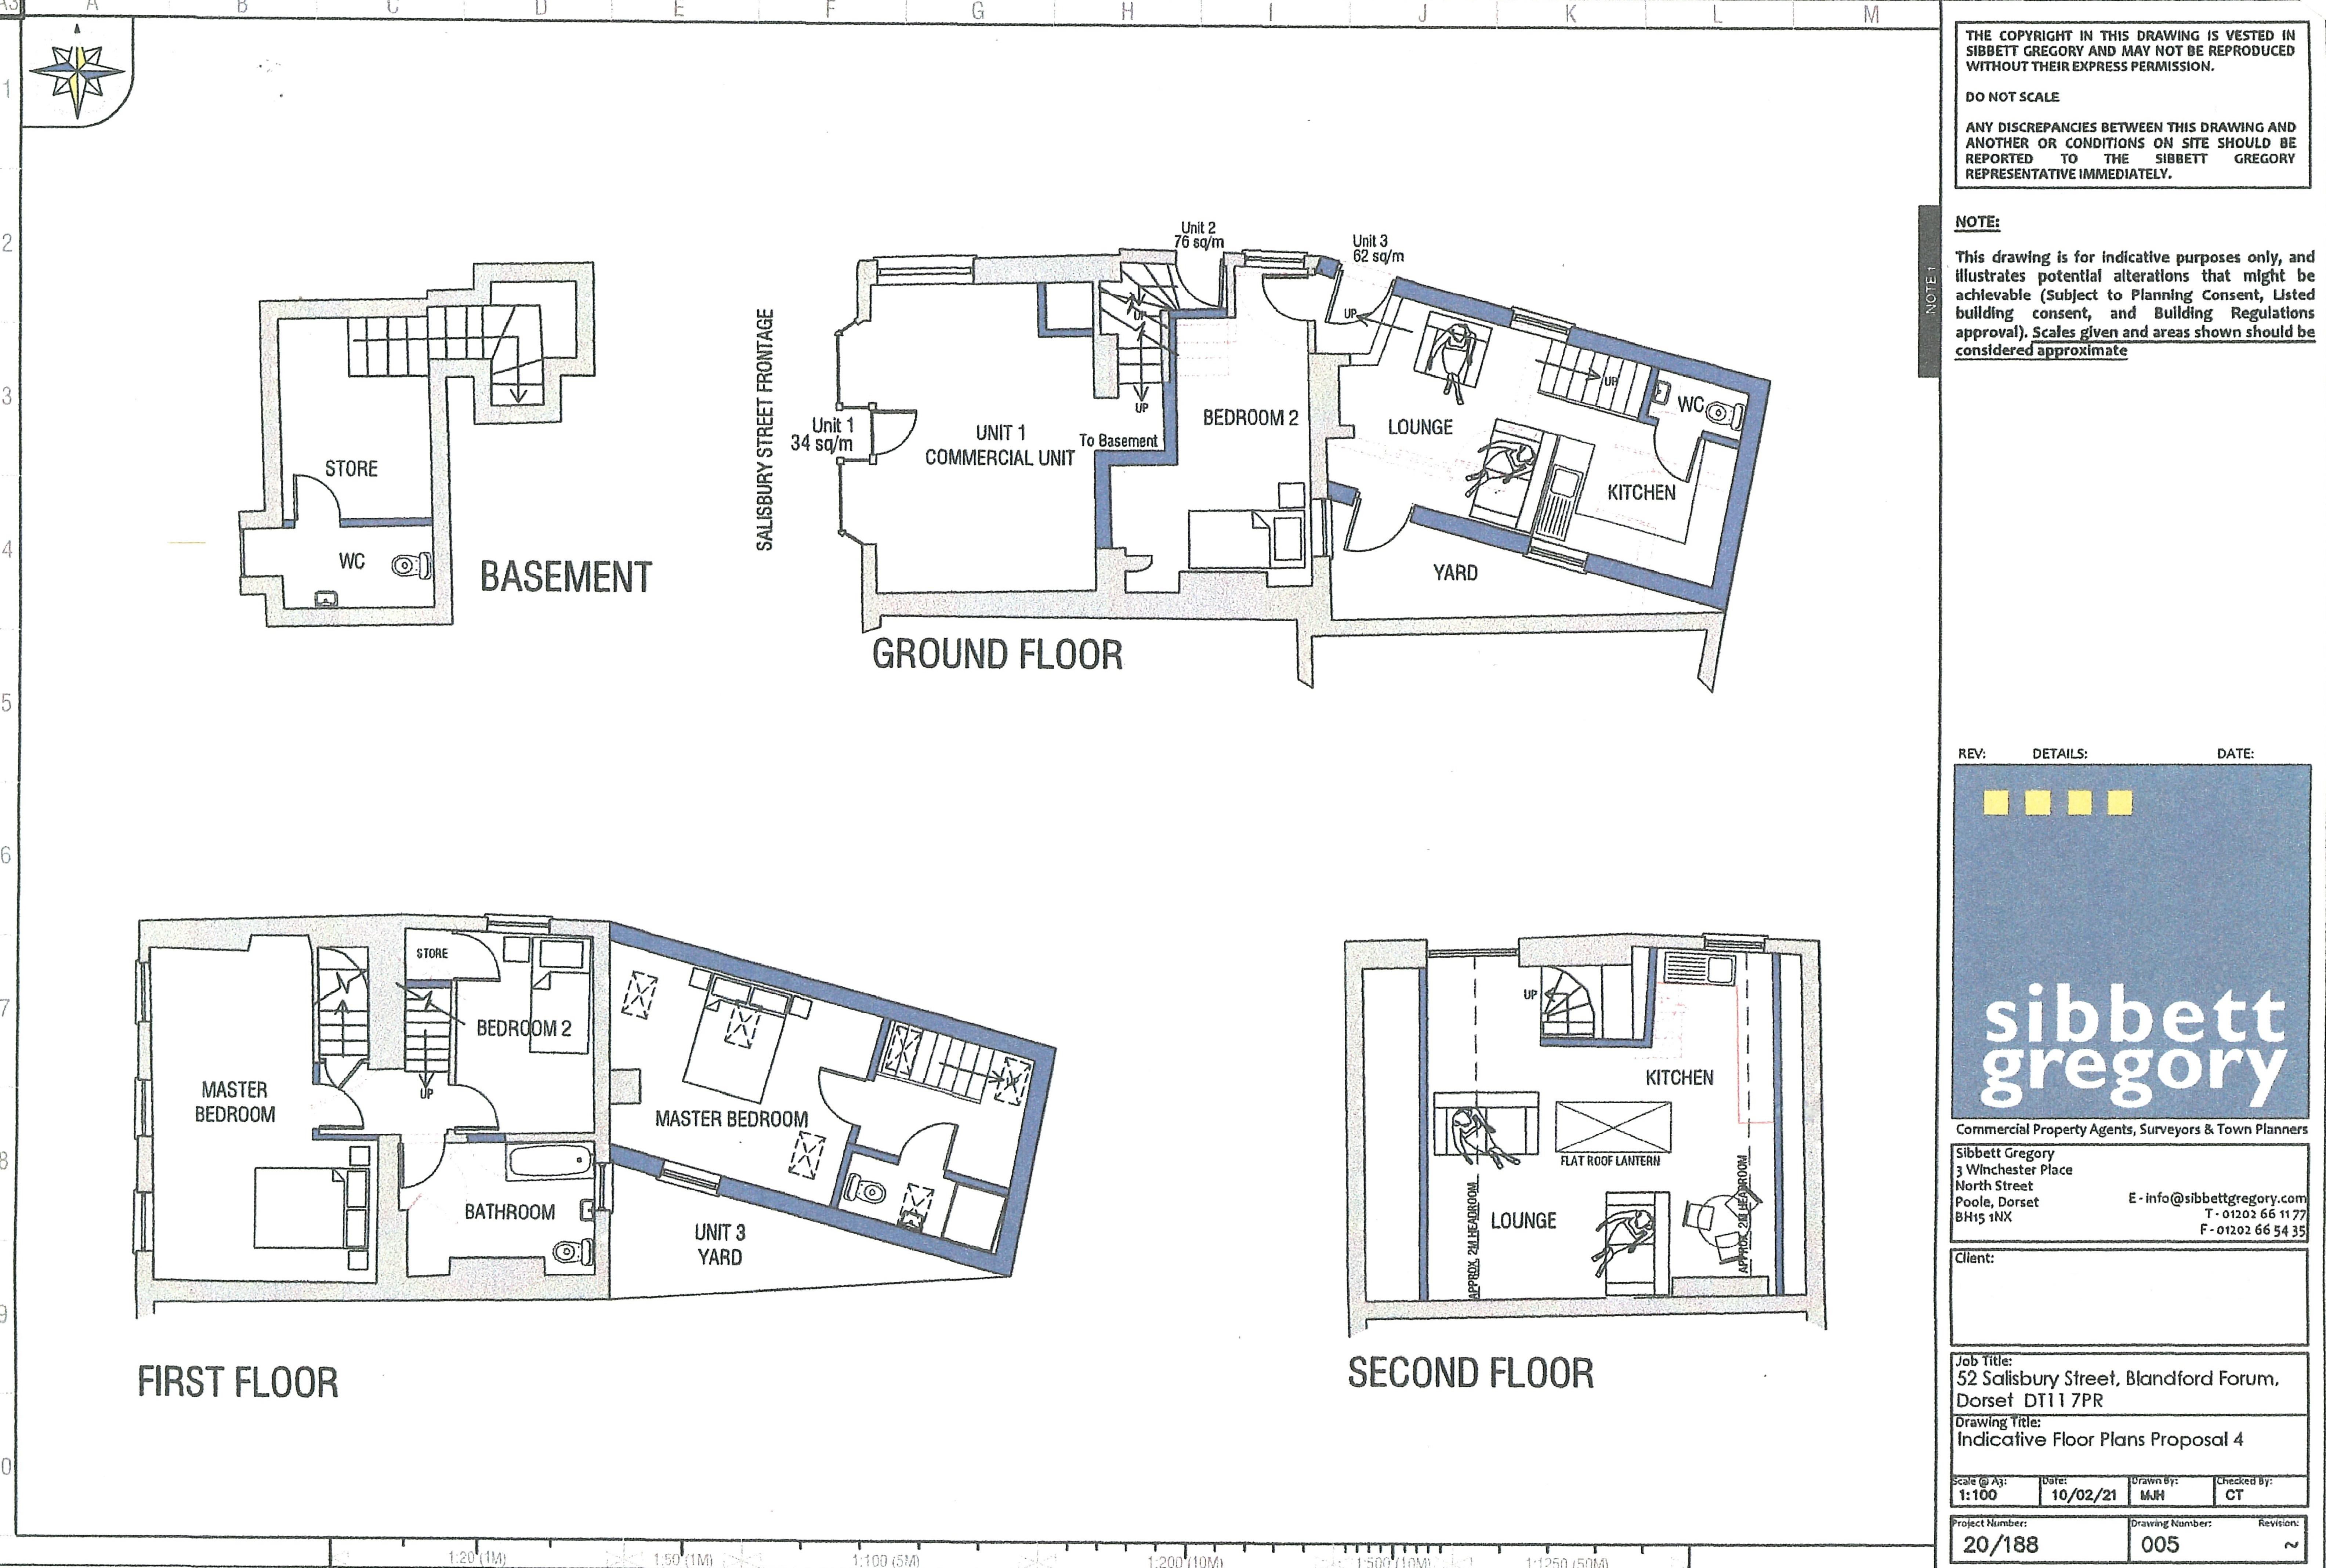 Floorplan - Salisbury Street, Blandford Forum, Dorset, DT11 7PR